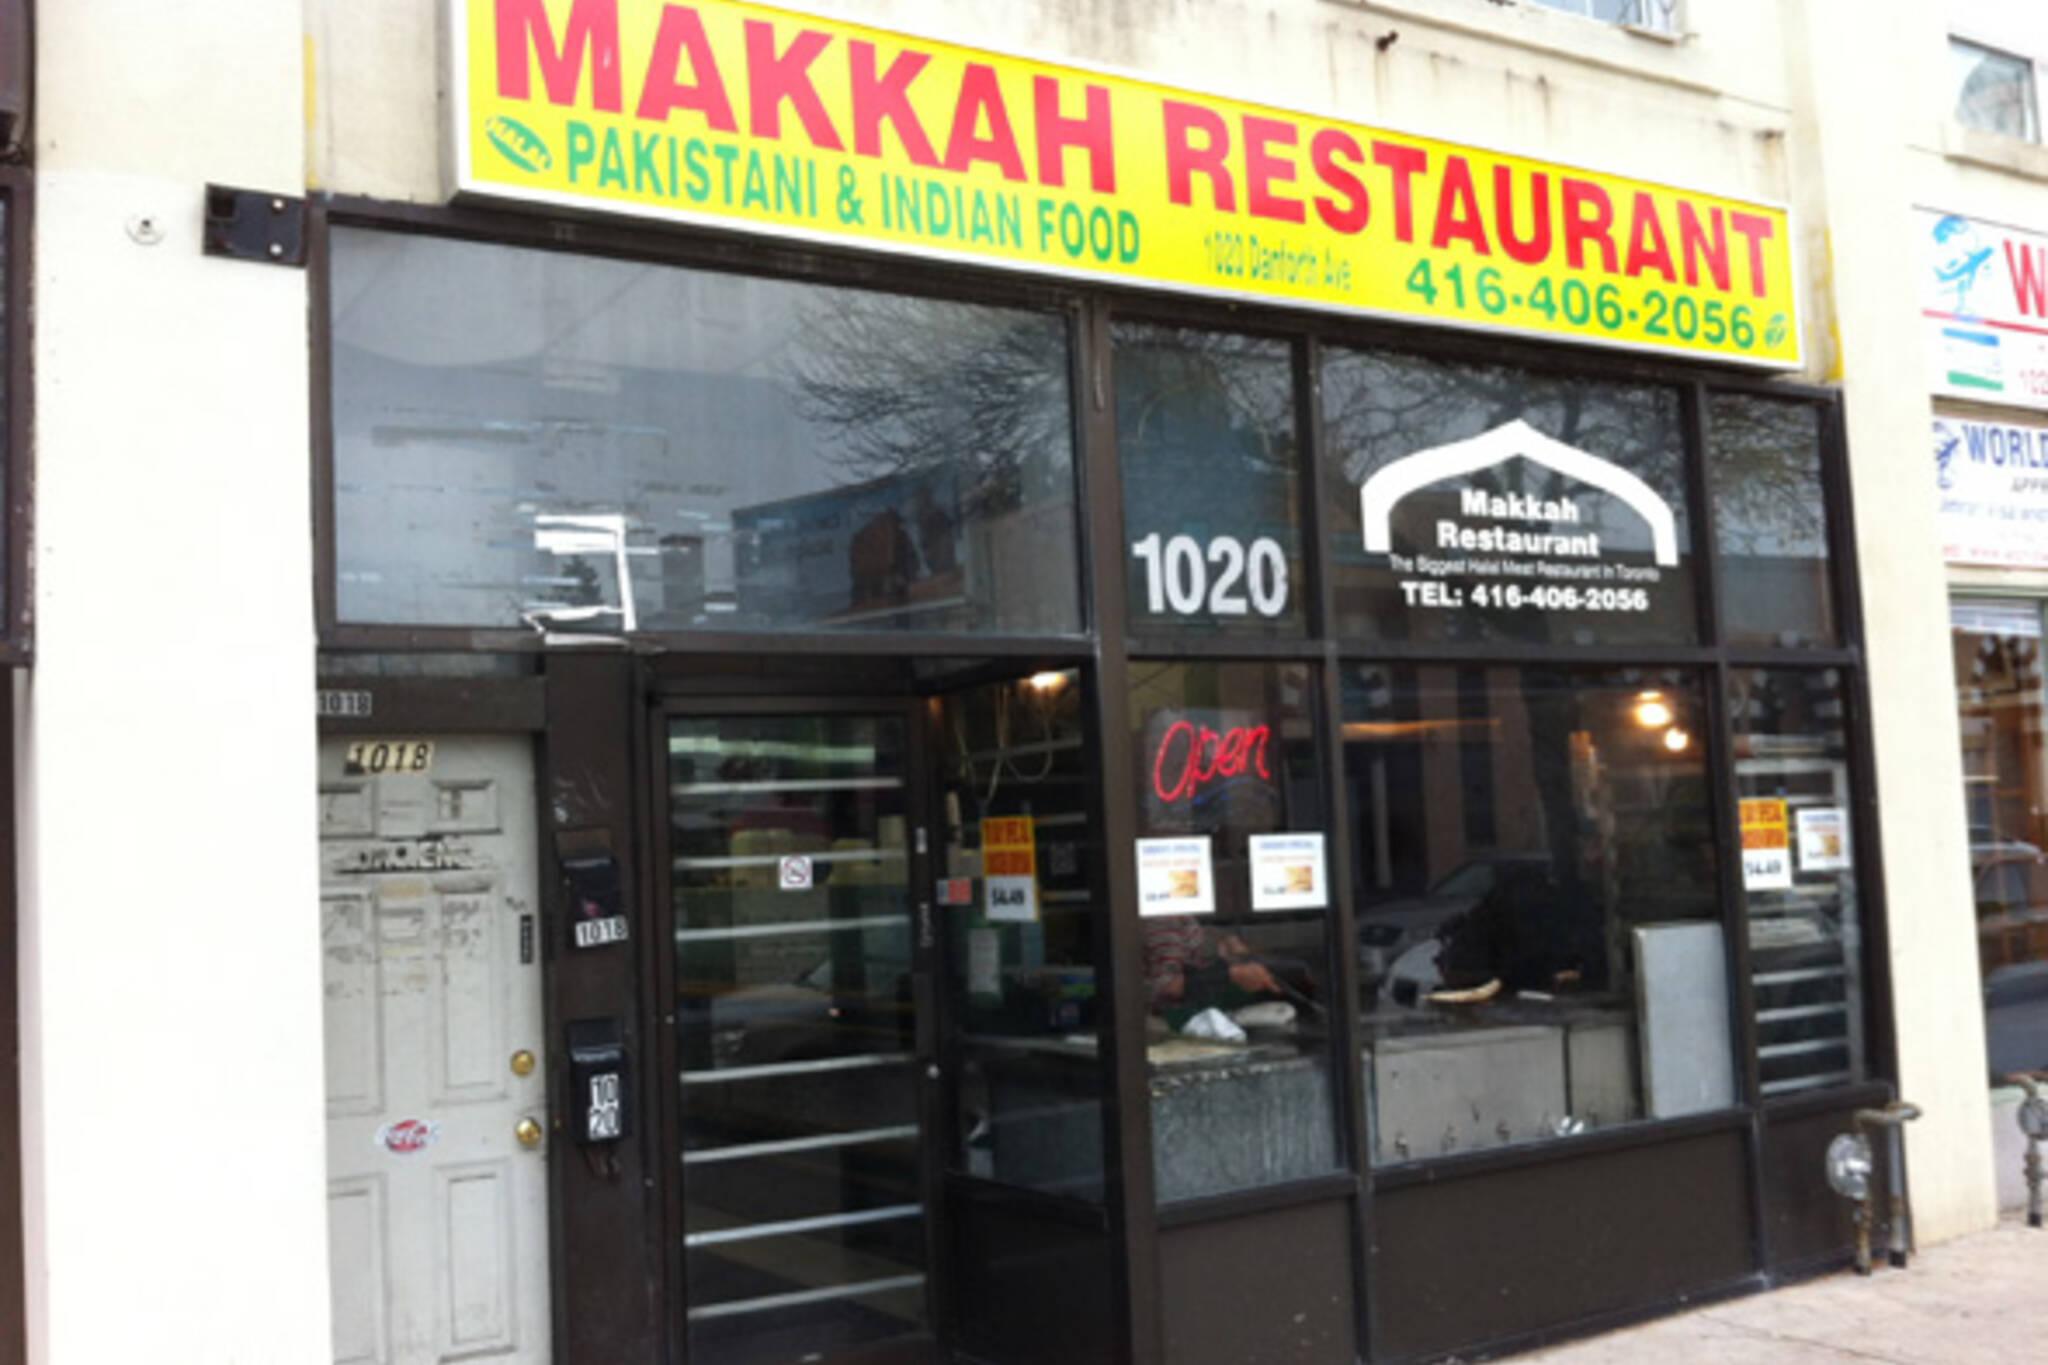 Makkah Restaurant